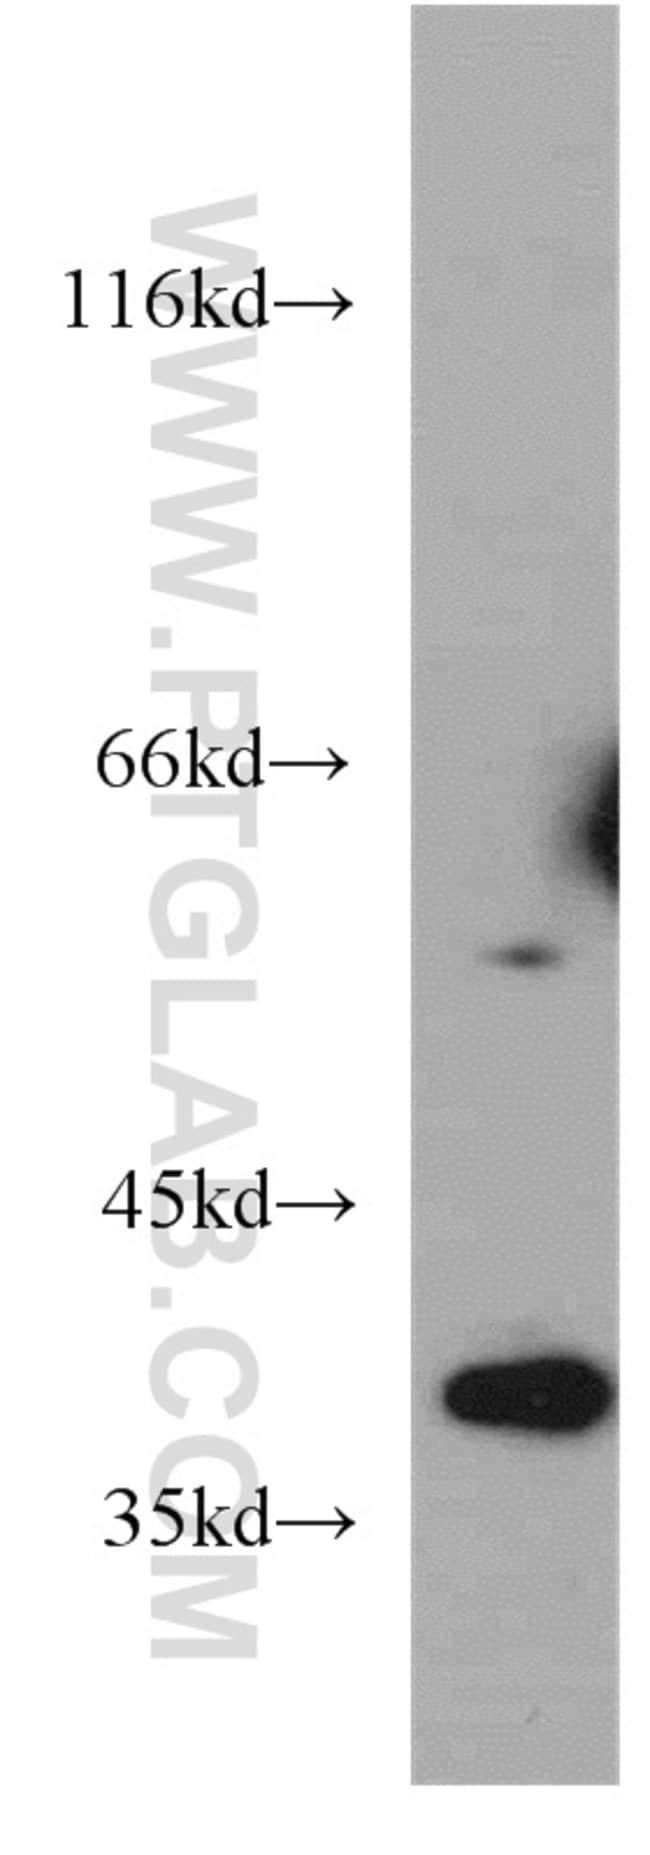 ELOVL4 Rabbit anti-Human, Mouse, Rat, Polyclonal, Proteintech 150 μL; Unconjugated Produkte